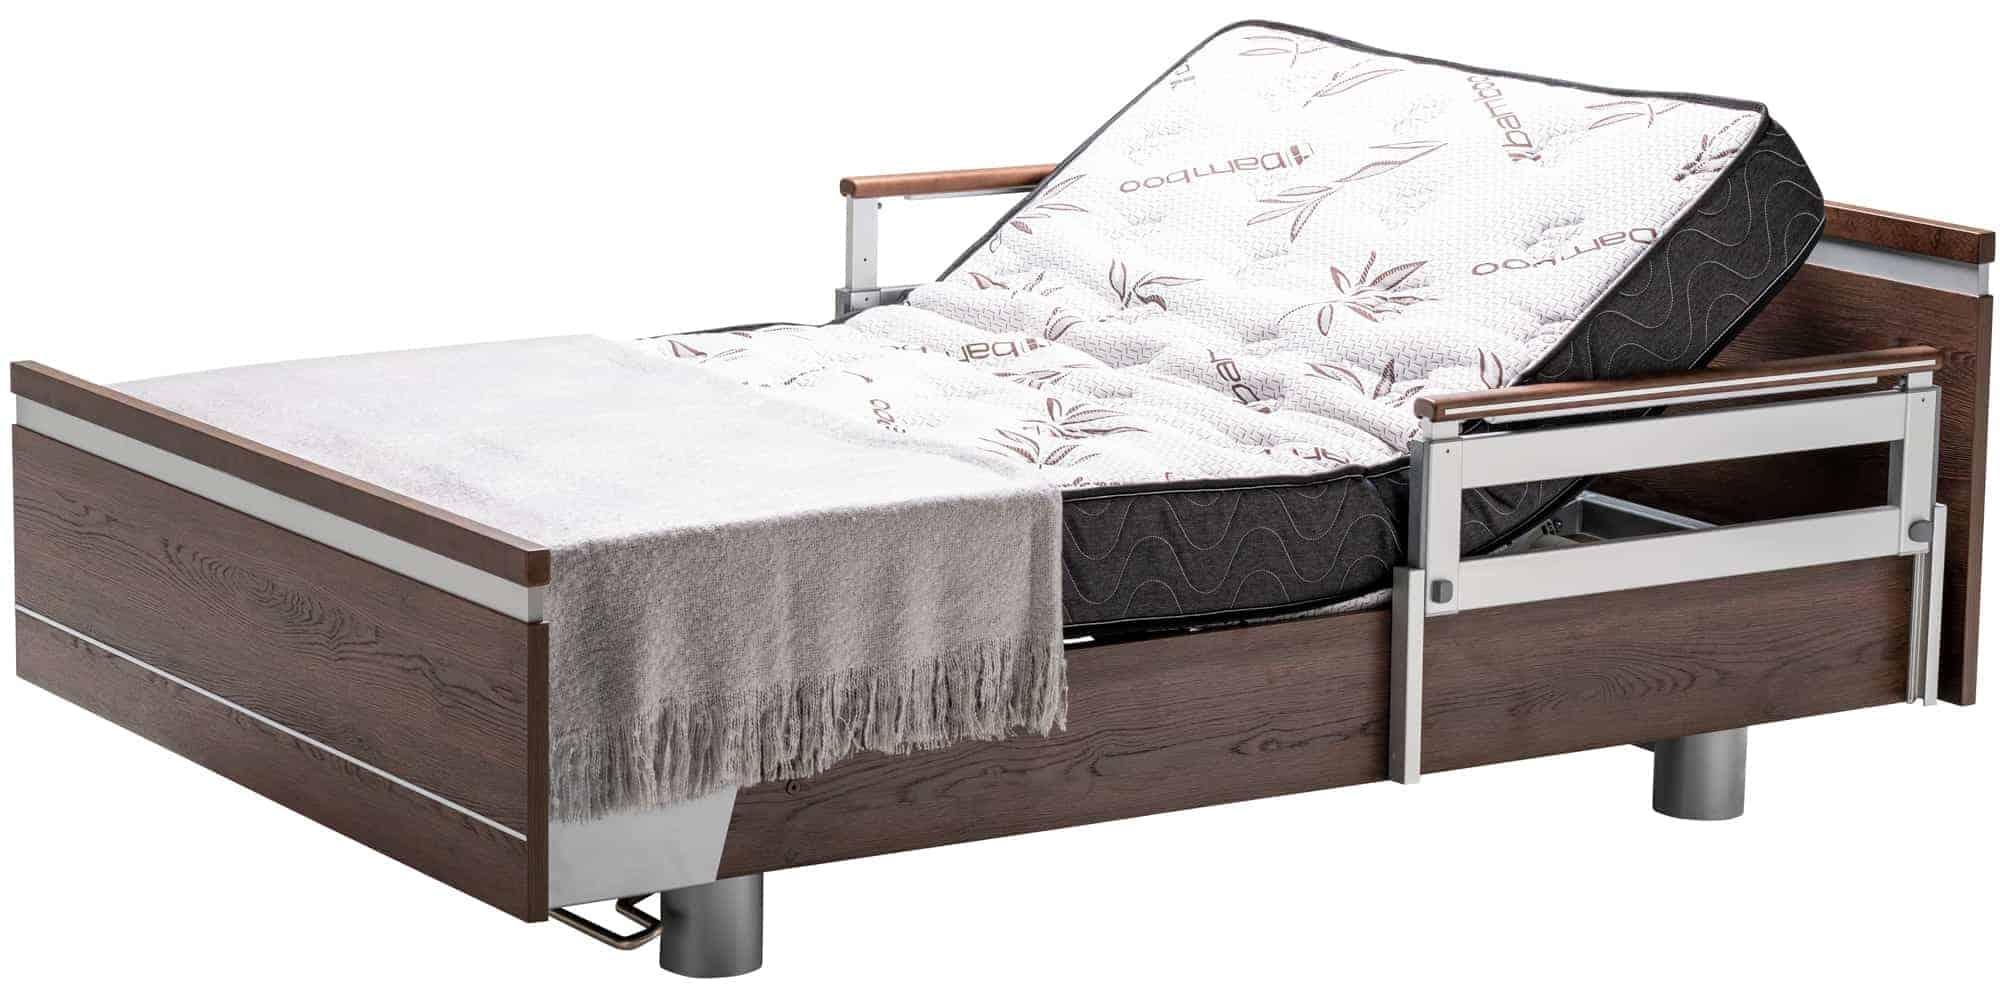 SonderCare Aura™ Wide Hospital Bed Head Adjusted Position